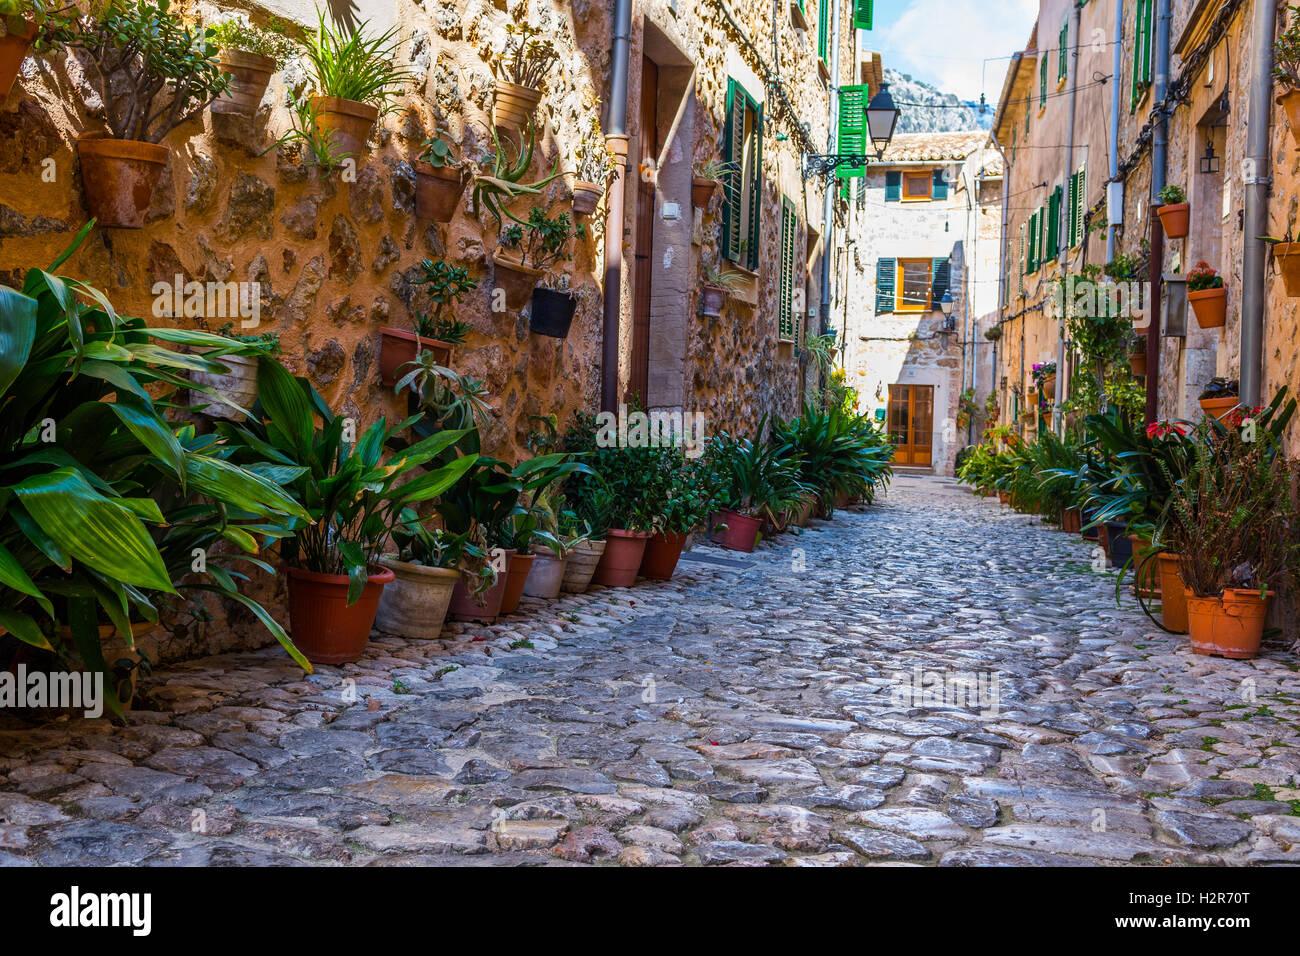 Plant Street in Valldemossa, Majorca - Stock Image